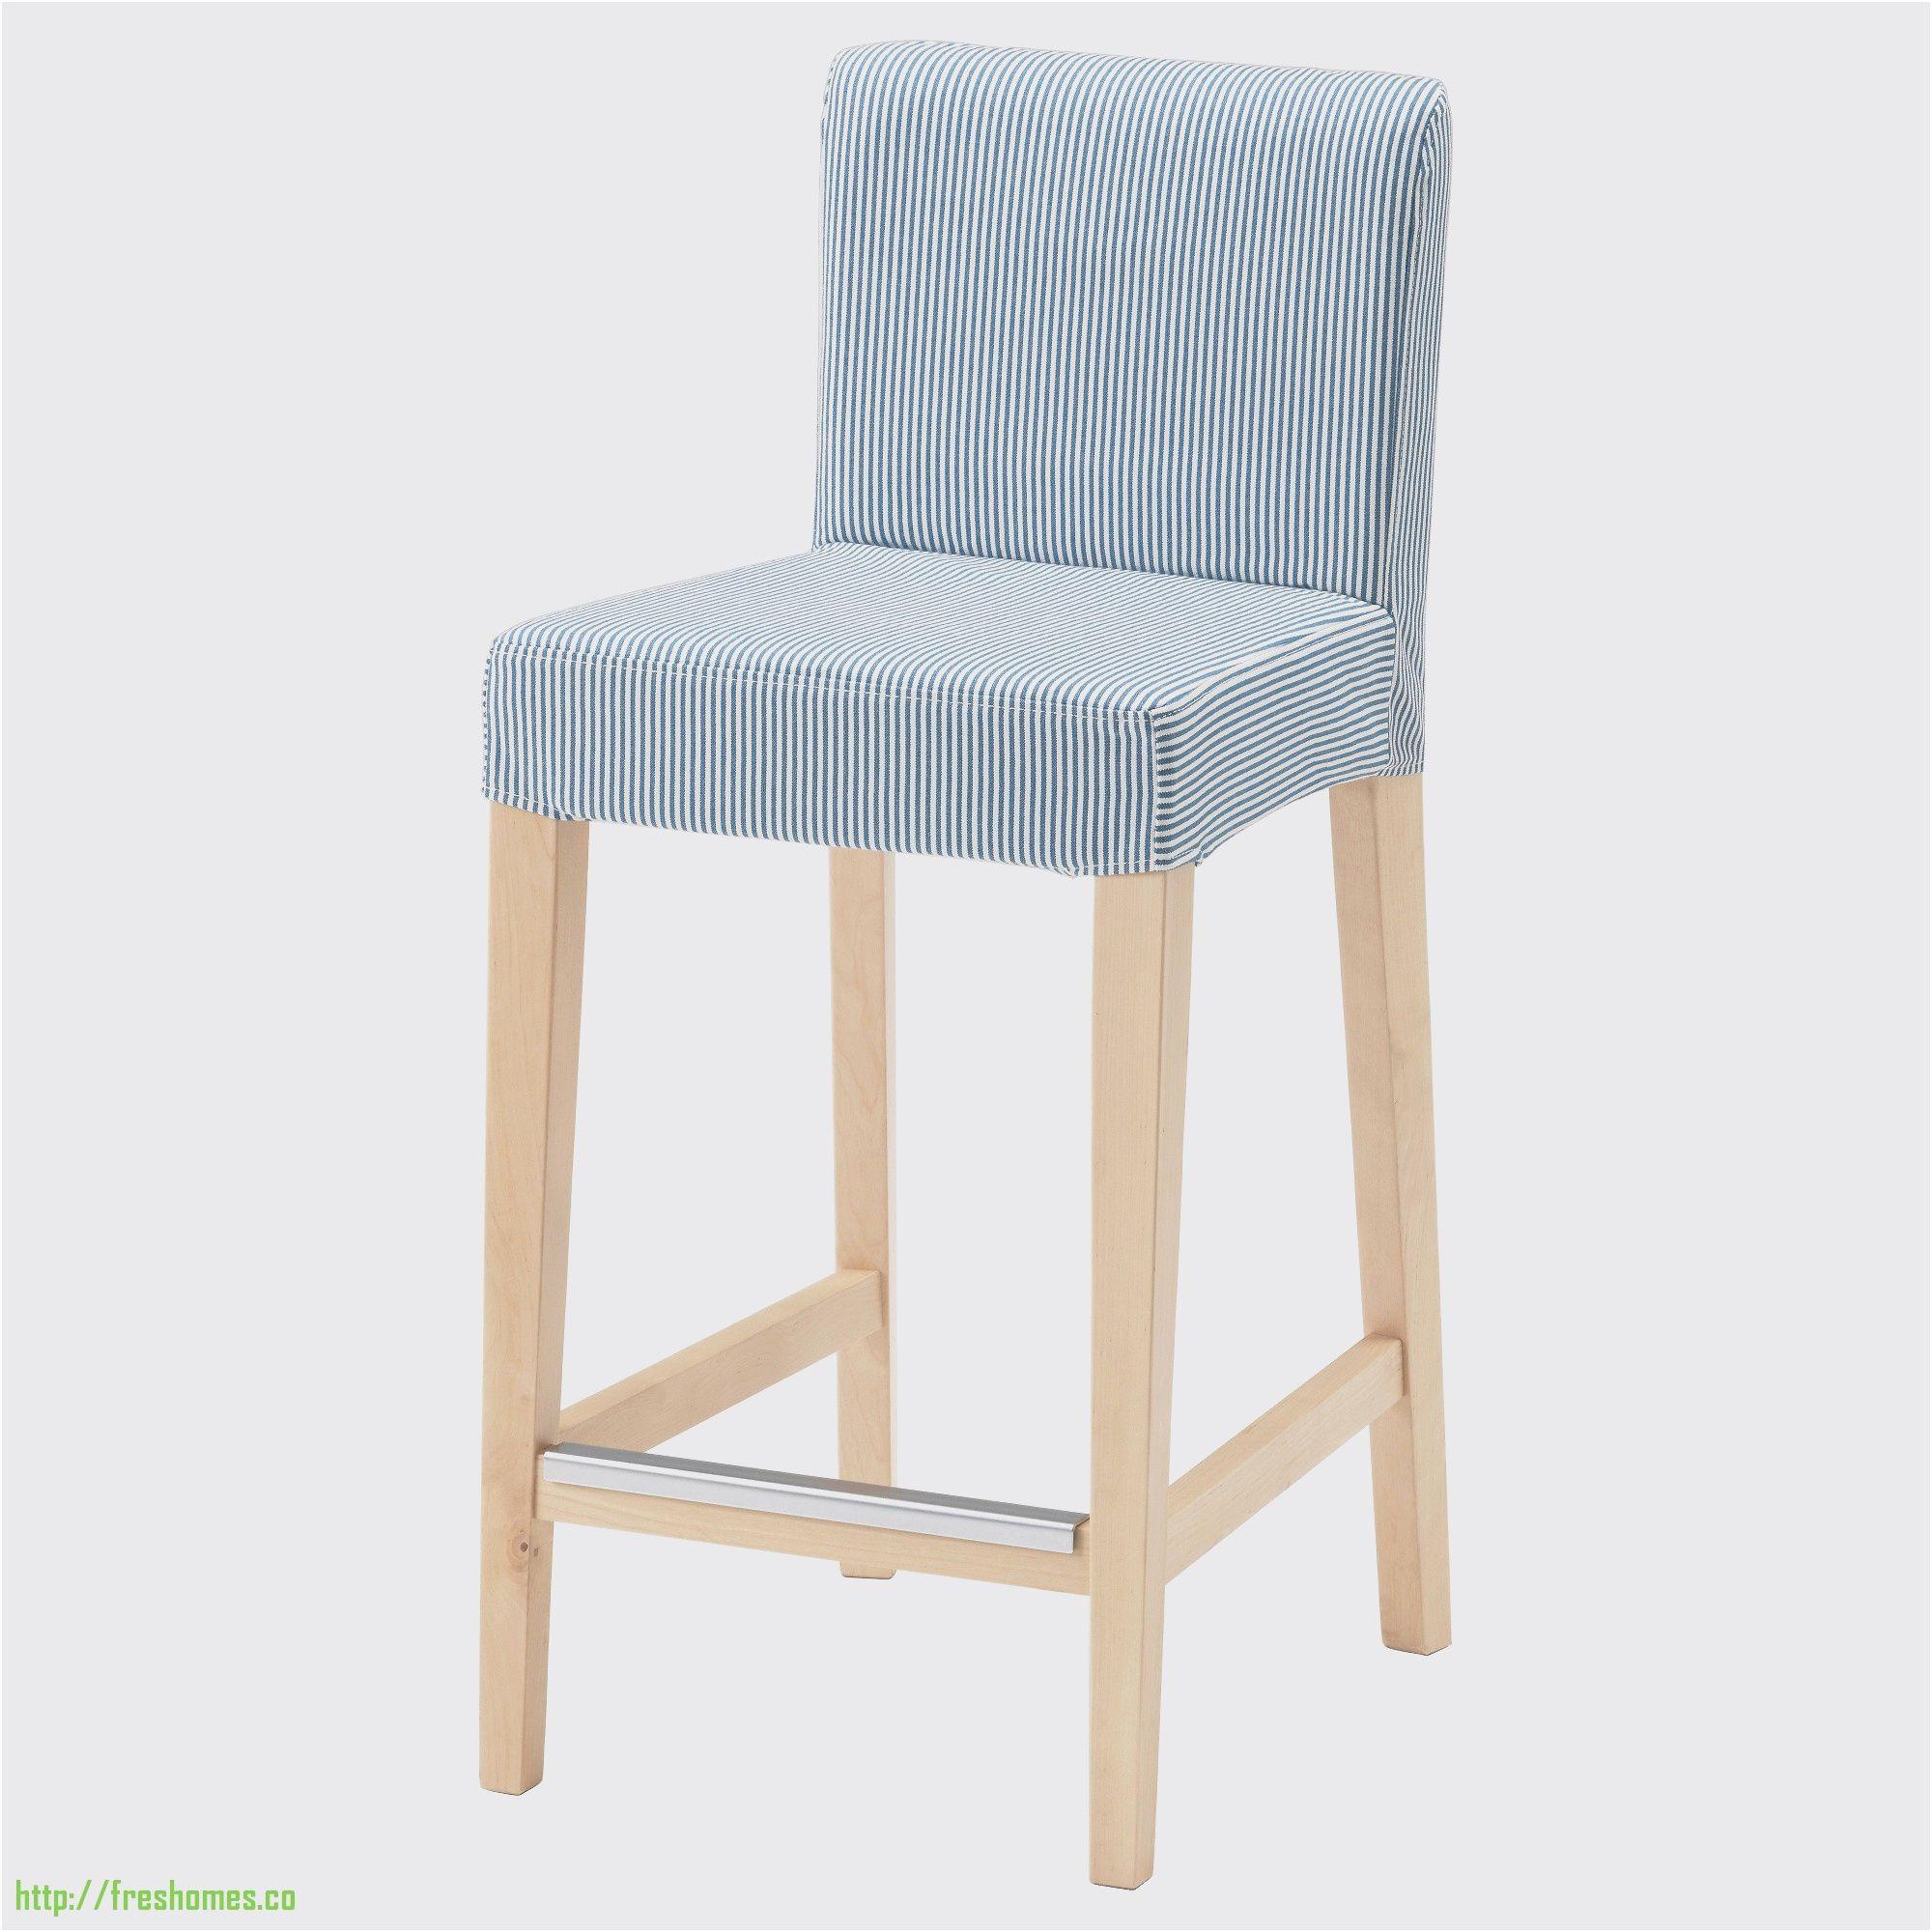 15 Acceptable Chaise Oeuf Ikea Photos